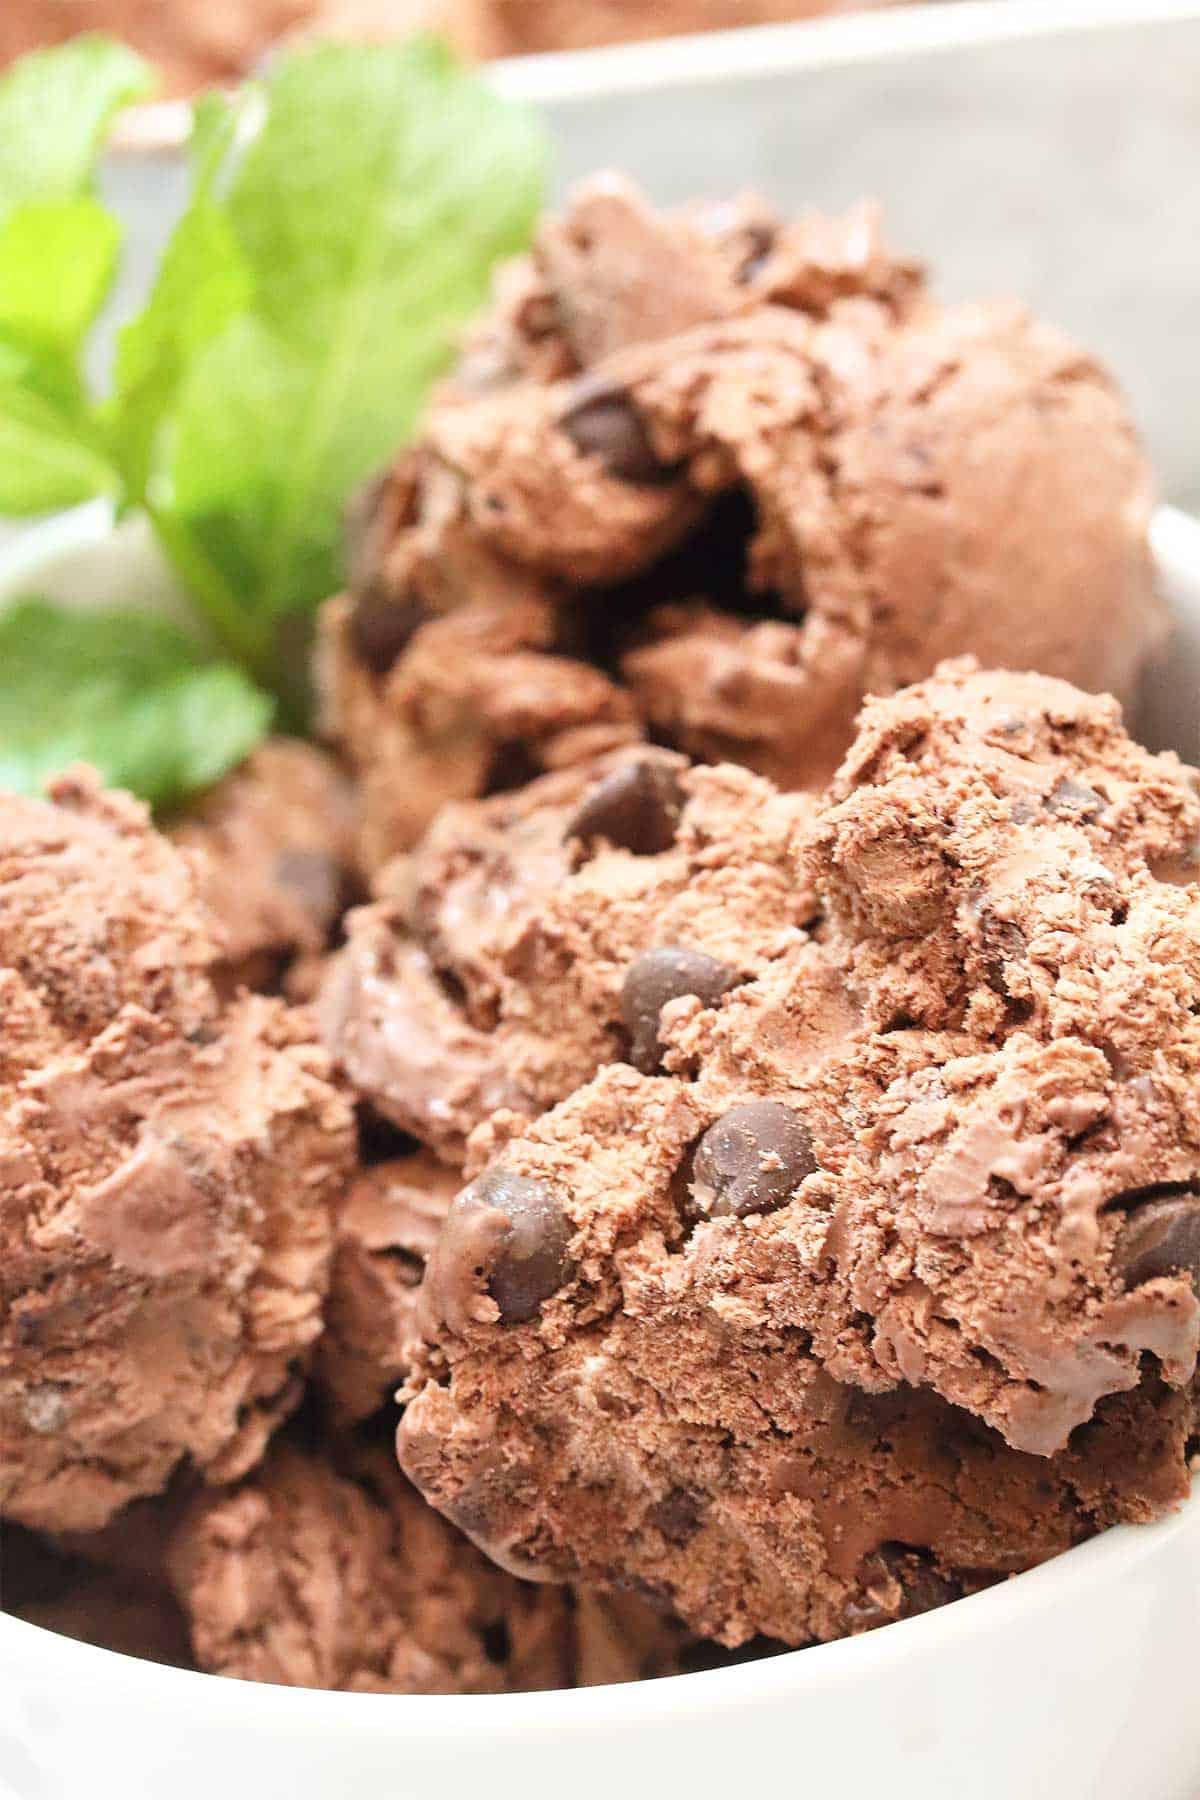 Extreme closeup of partial bowl of ice cream.